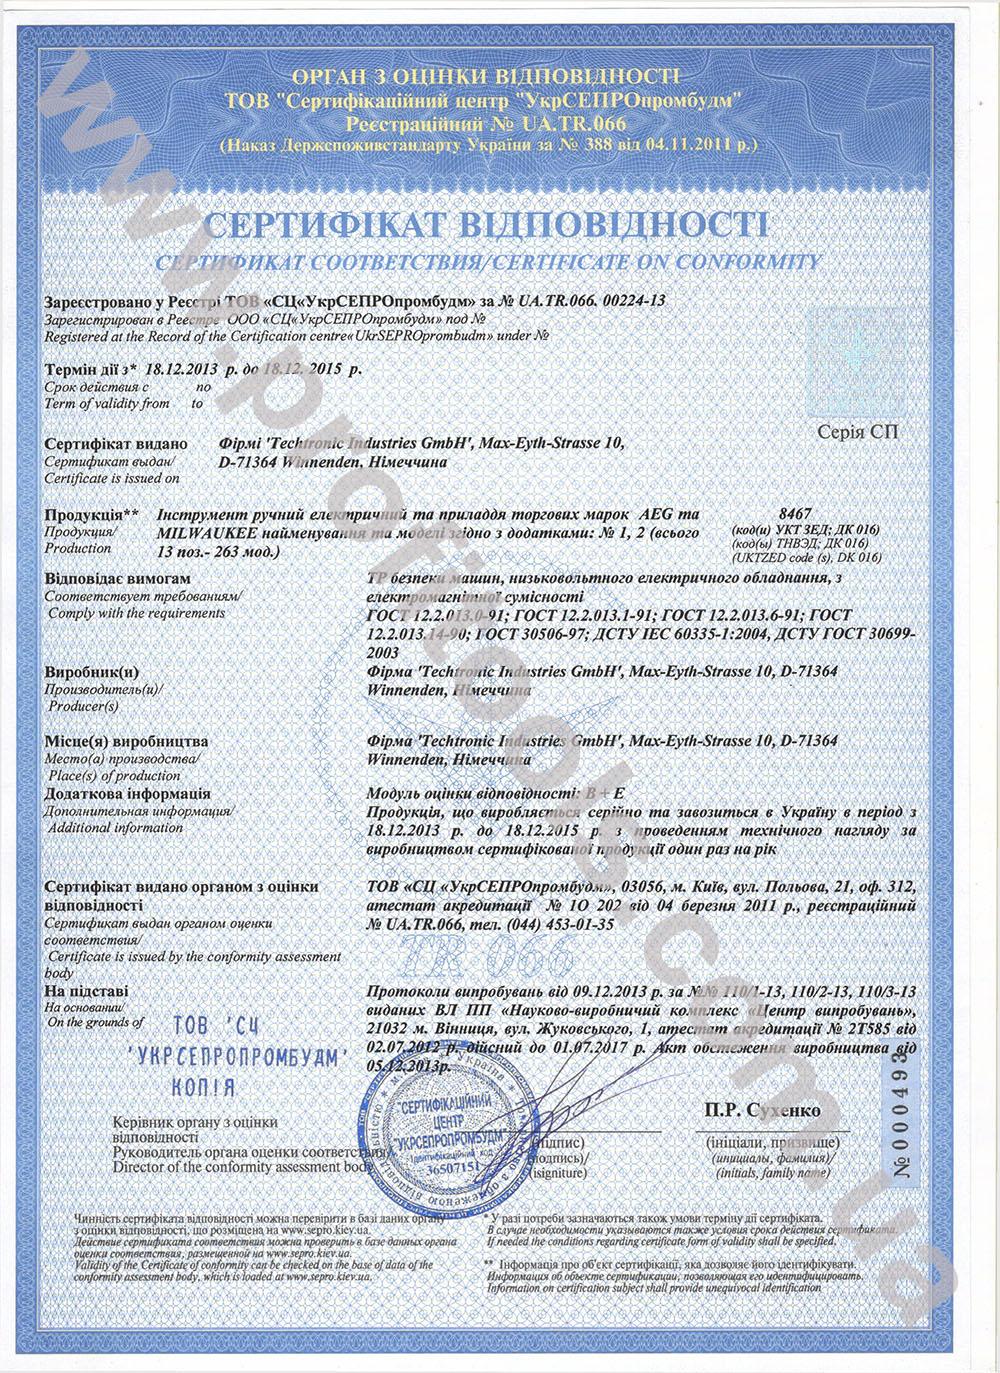 shares/Certificate/TTI/3.jpg